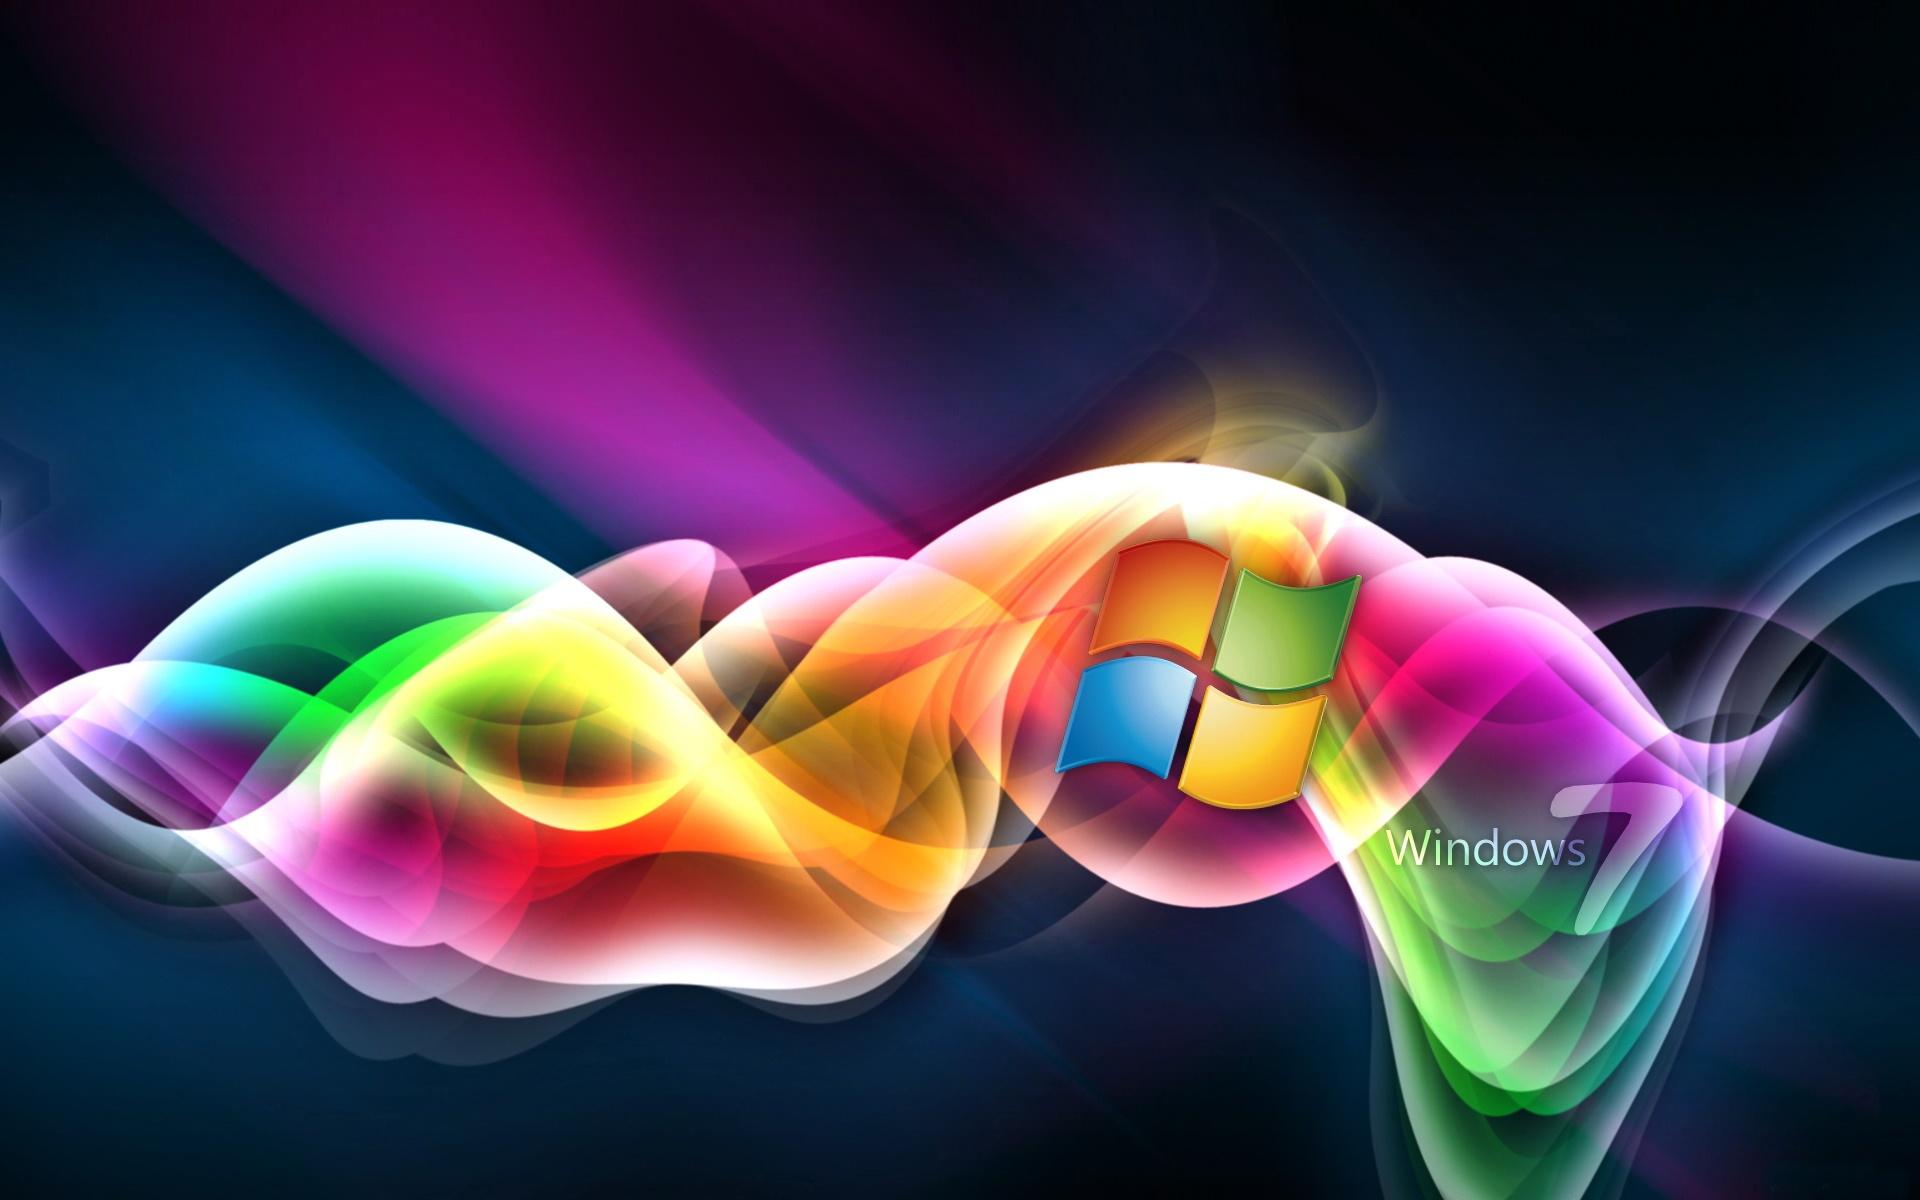 Windows 7 Wallpapers Windows 7 Backgrounds Windows 7 HD 1920x1200